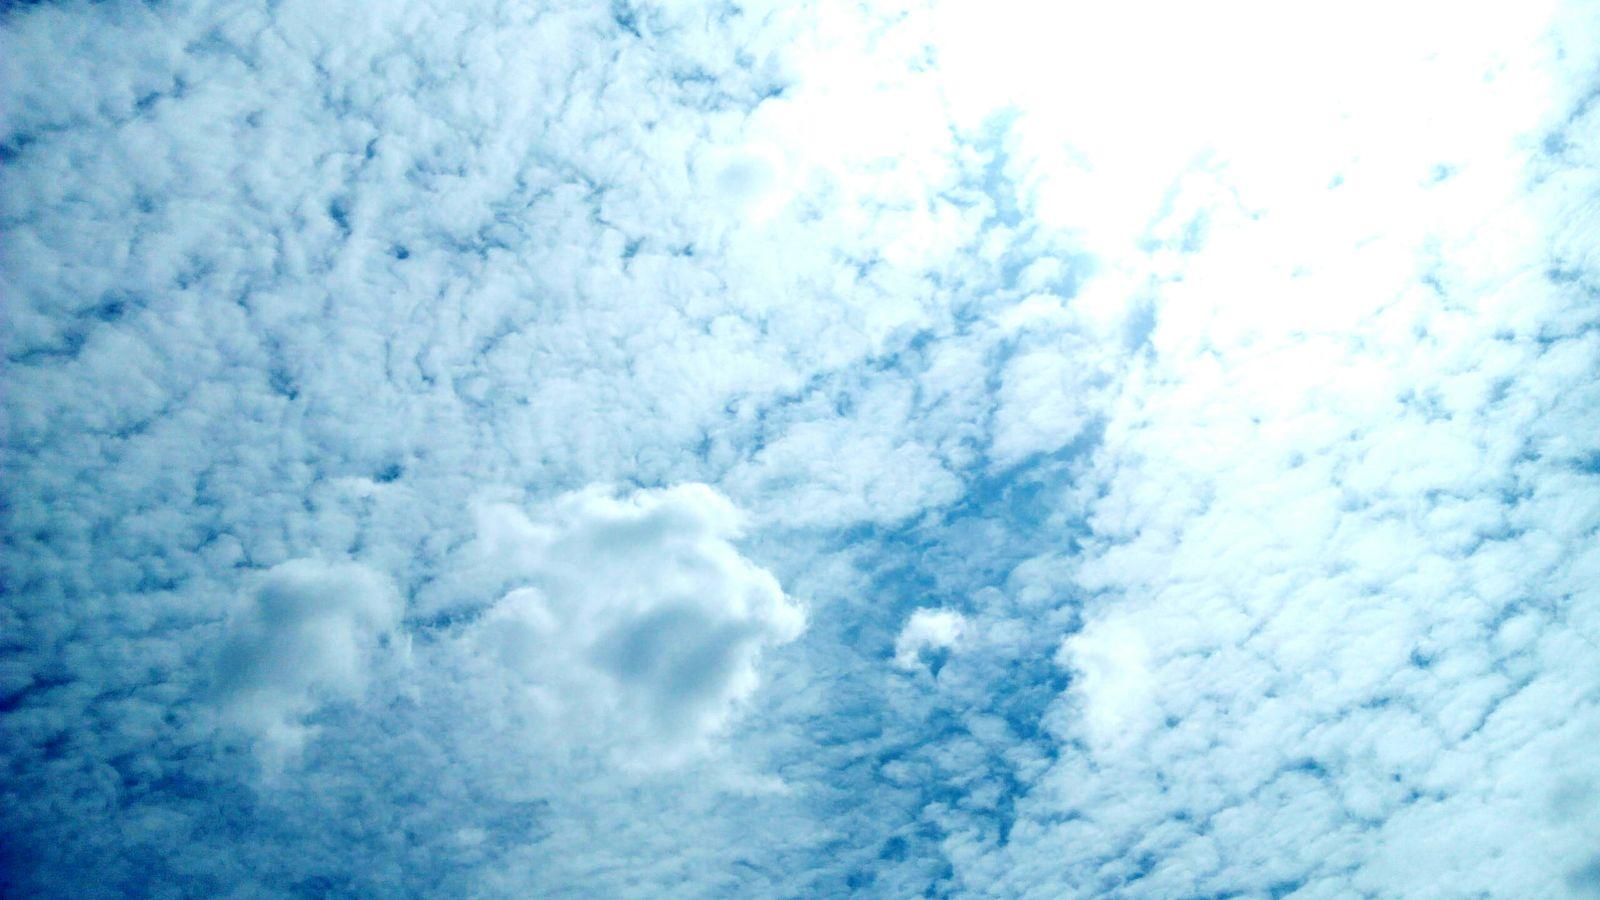 Summer2015 Sky And Clouds Beautiful Sky Bila Tserkva Ukraine Amazing God